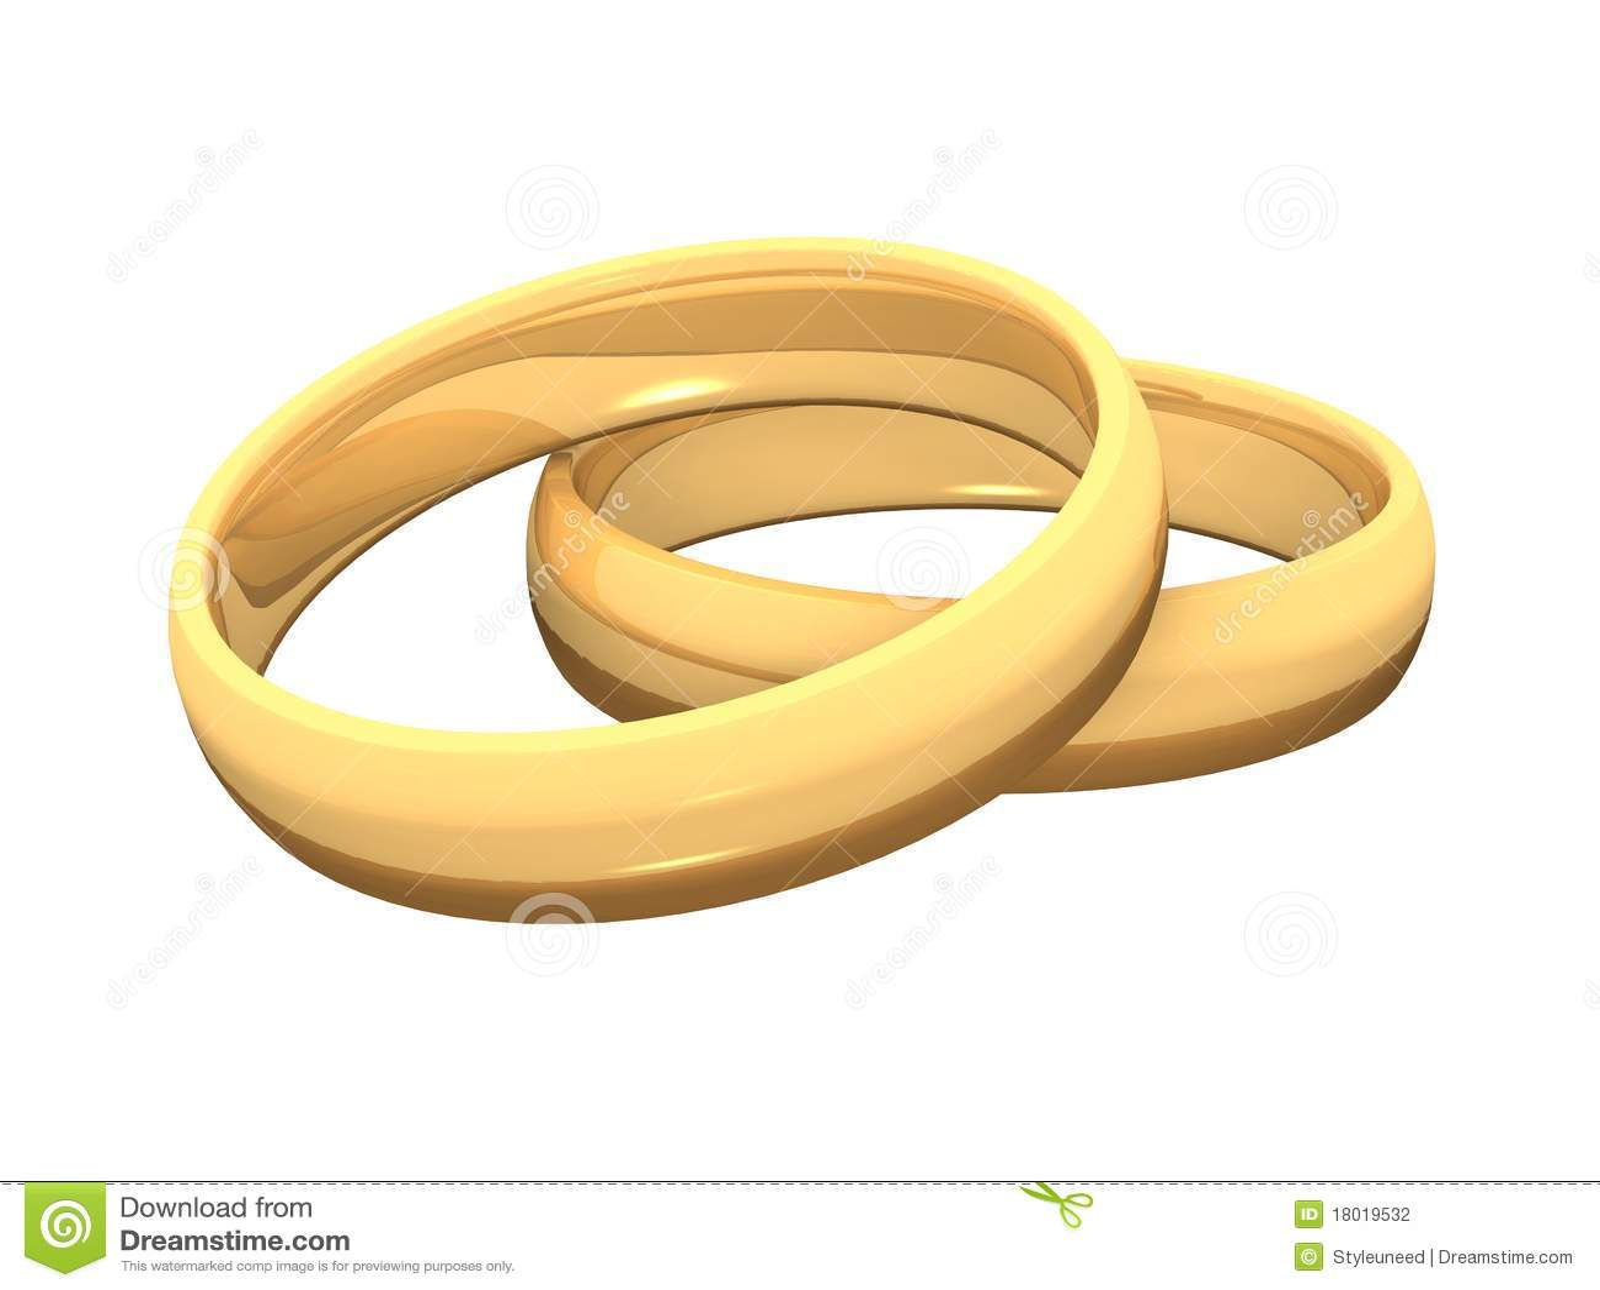 goldene ringe 3d f r hochzeit 05 stockfotografie bild 18019532. Black Bedroom Furniture Sets. Home Design Ideas